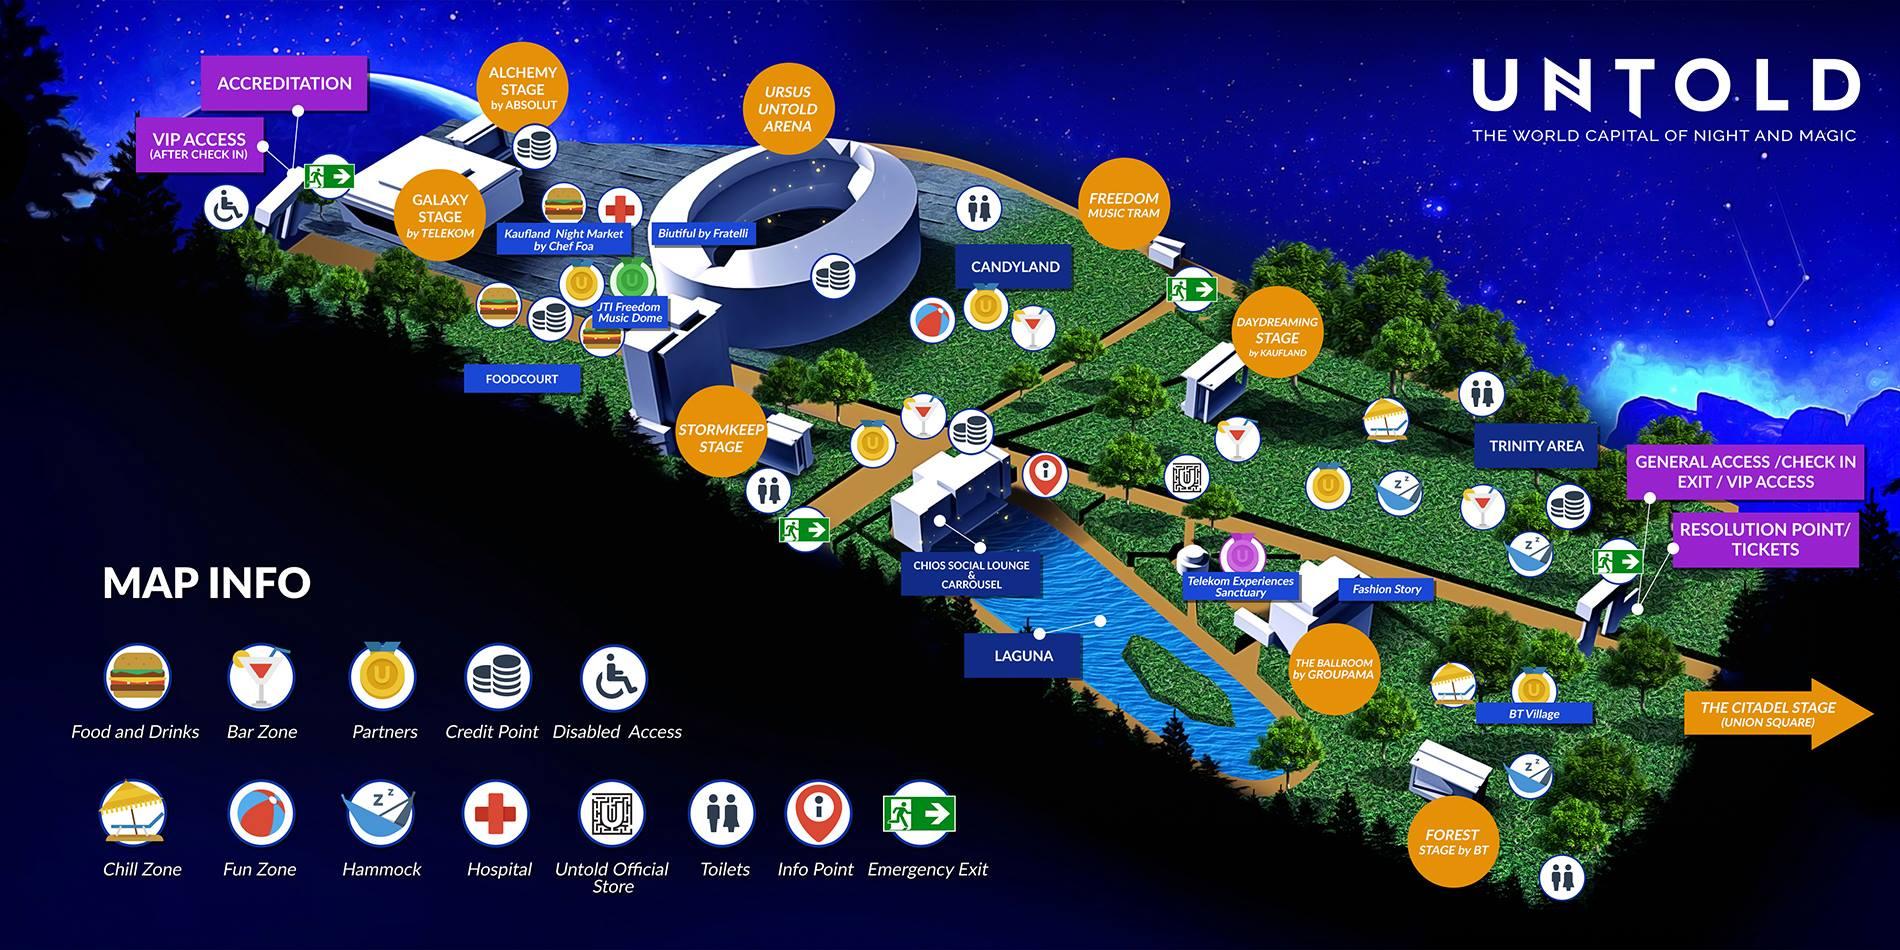 untold festival 2016 map